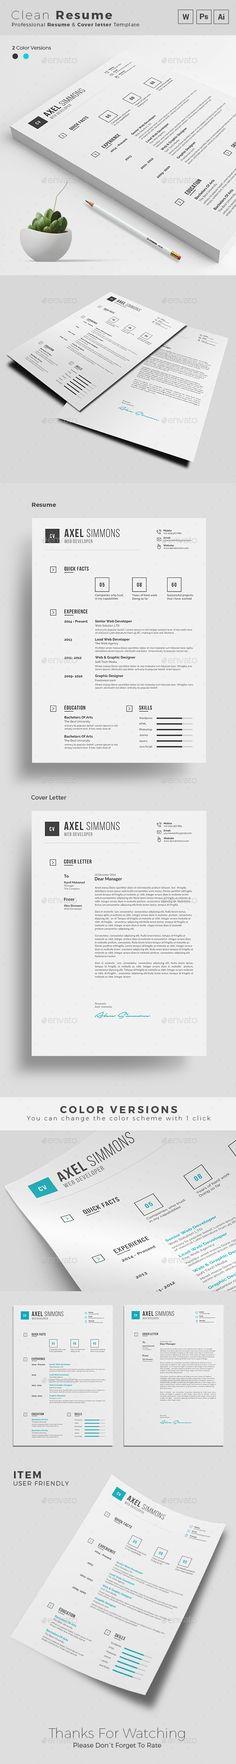 Clean Resume CV, #Cover letter, #ResumeDownload here   - clean resume design